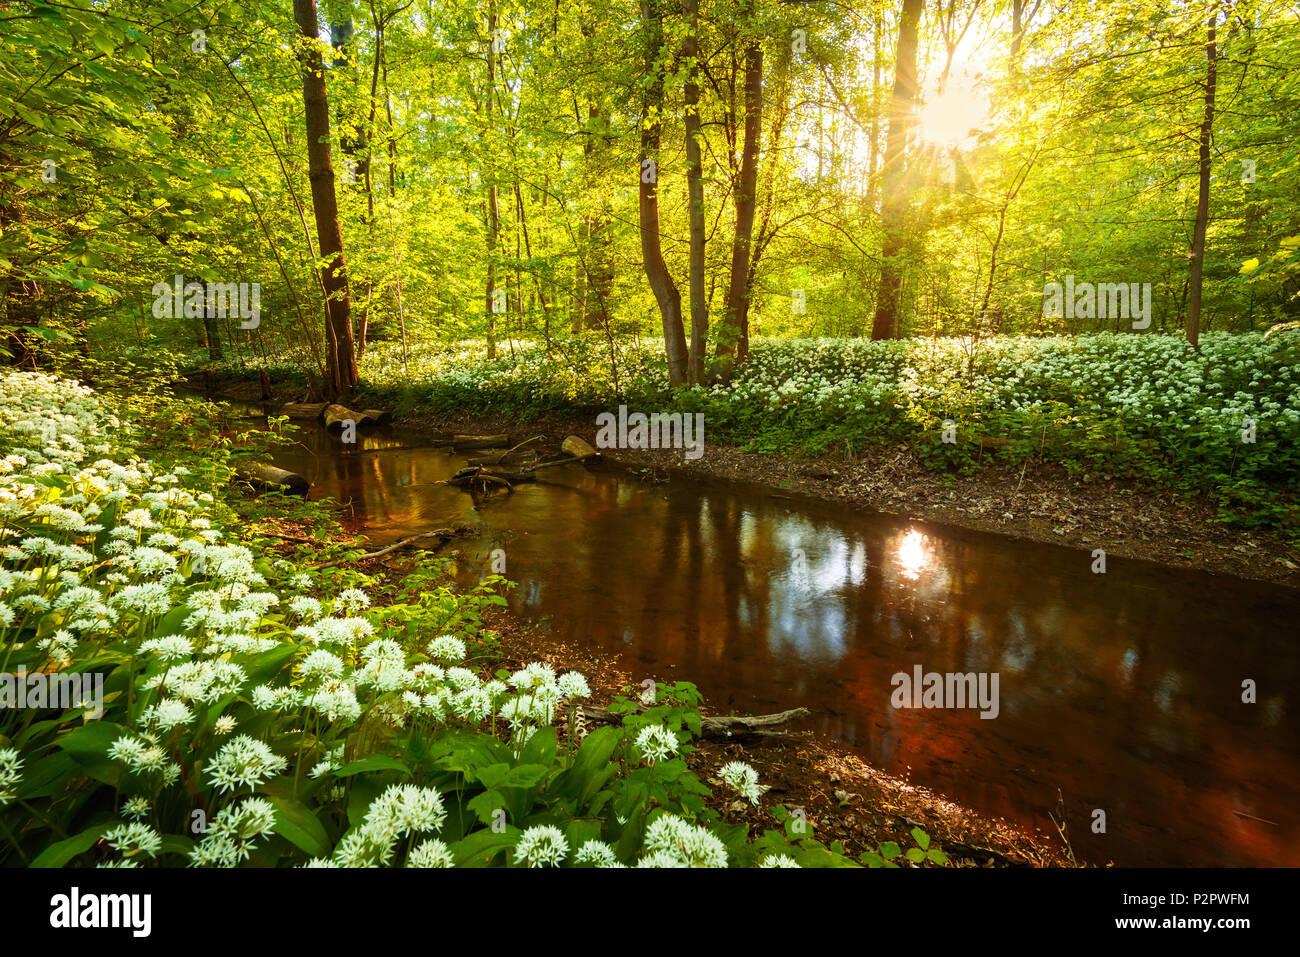 Sun, Forest, River, Bears Garlic, Wildflower, Spring, Park, Leipzig, Germany, Europe - Stock Image